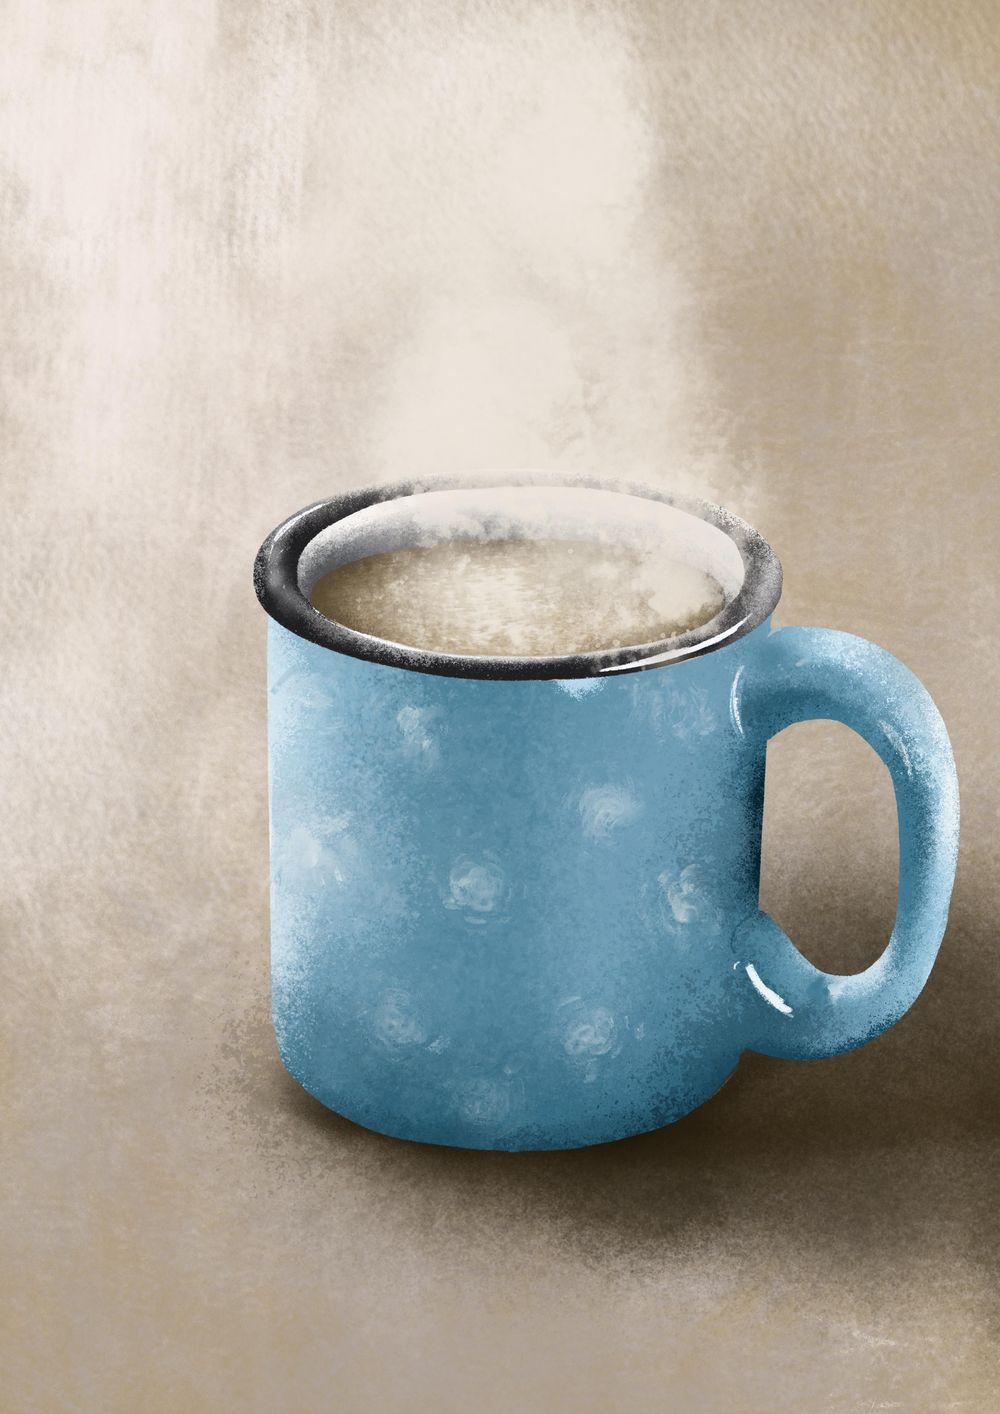 Blue mug - image 1 - student project